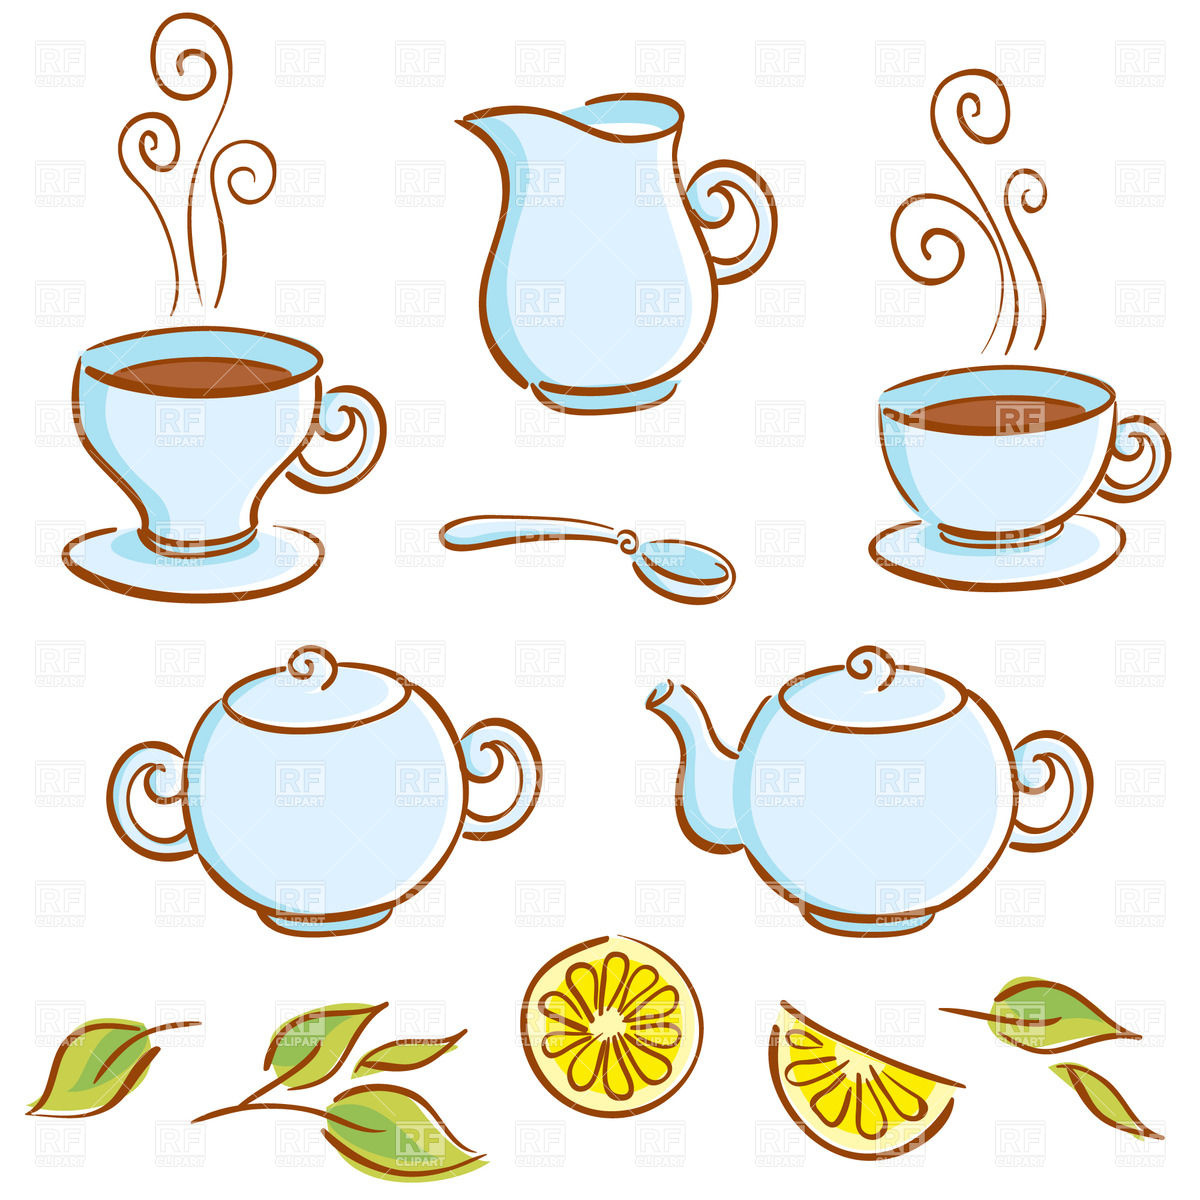 Background With Cartoon Tea-set, Lemon A-Background with cartoon tea-set, lemon and cup of coffee - sugar-bowl,  teapot, cup, saucer, spoon and milk jug Royalty Free Vector Clip Art-2